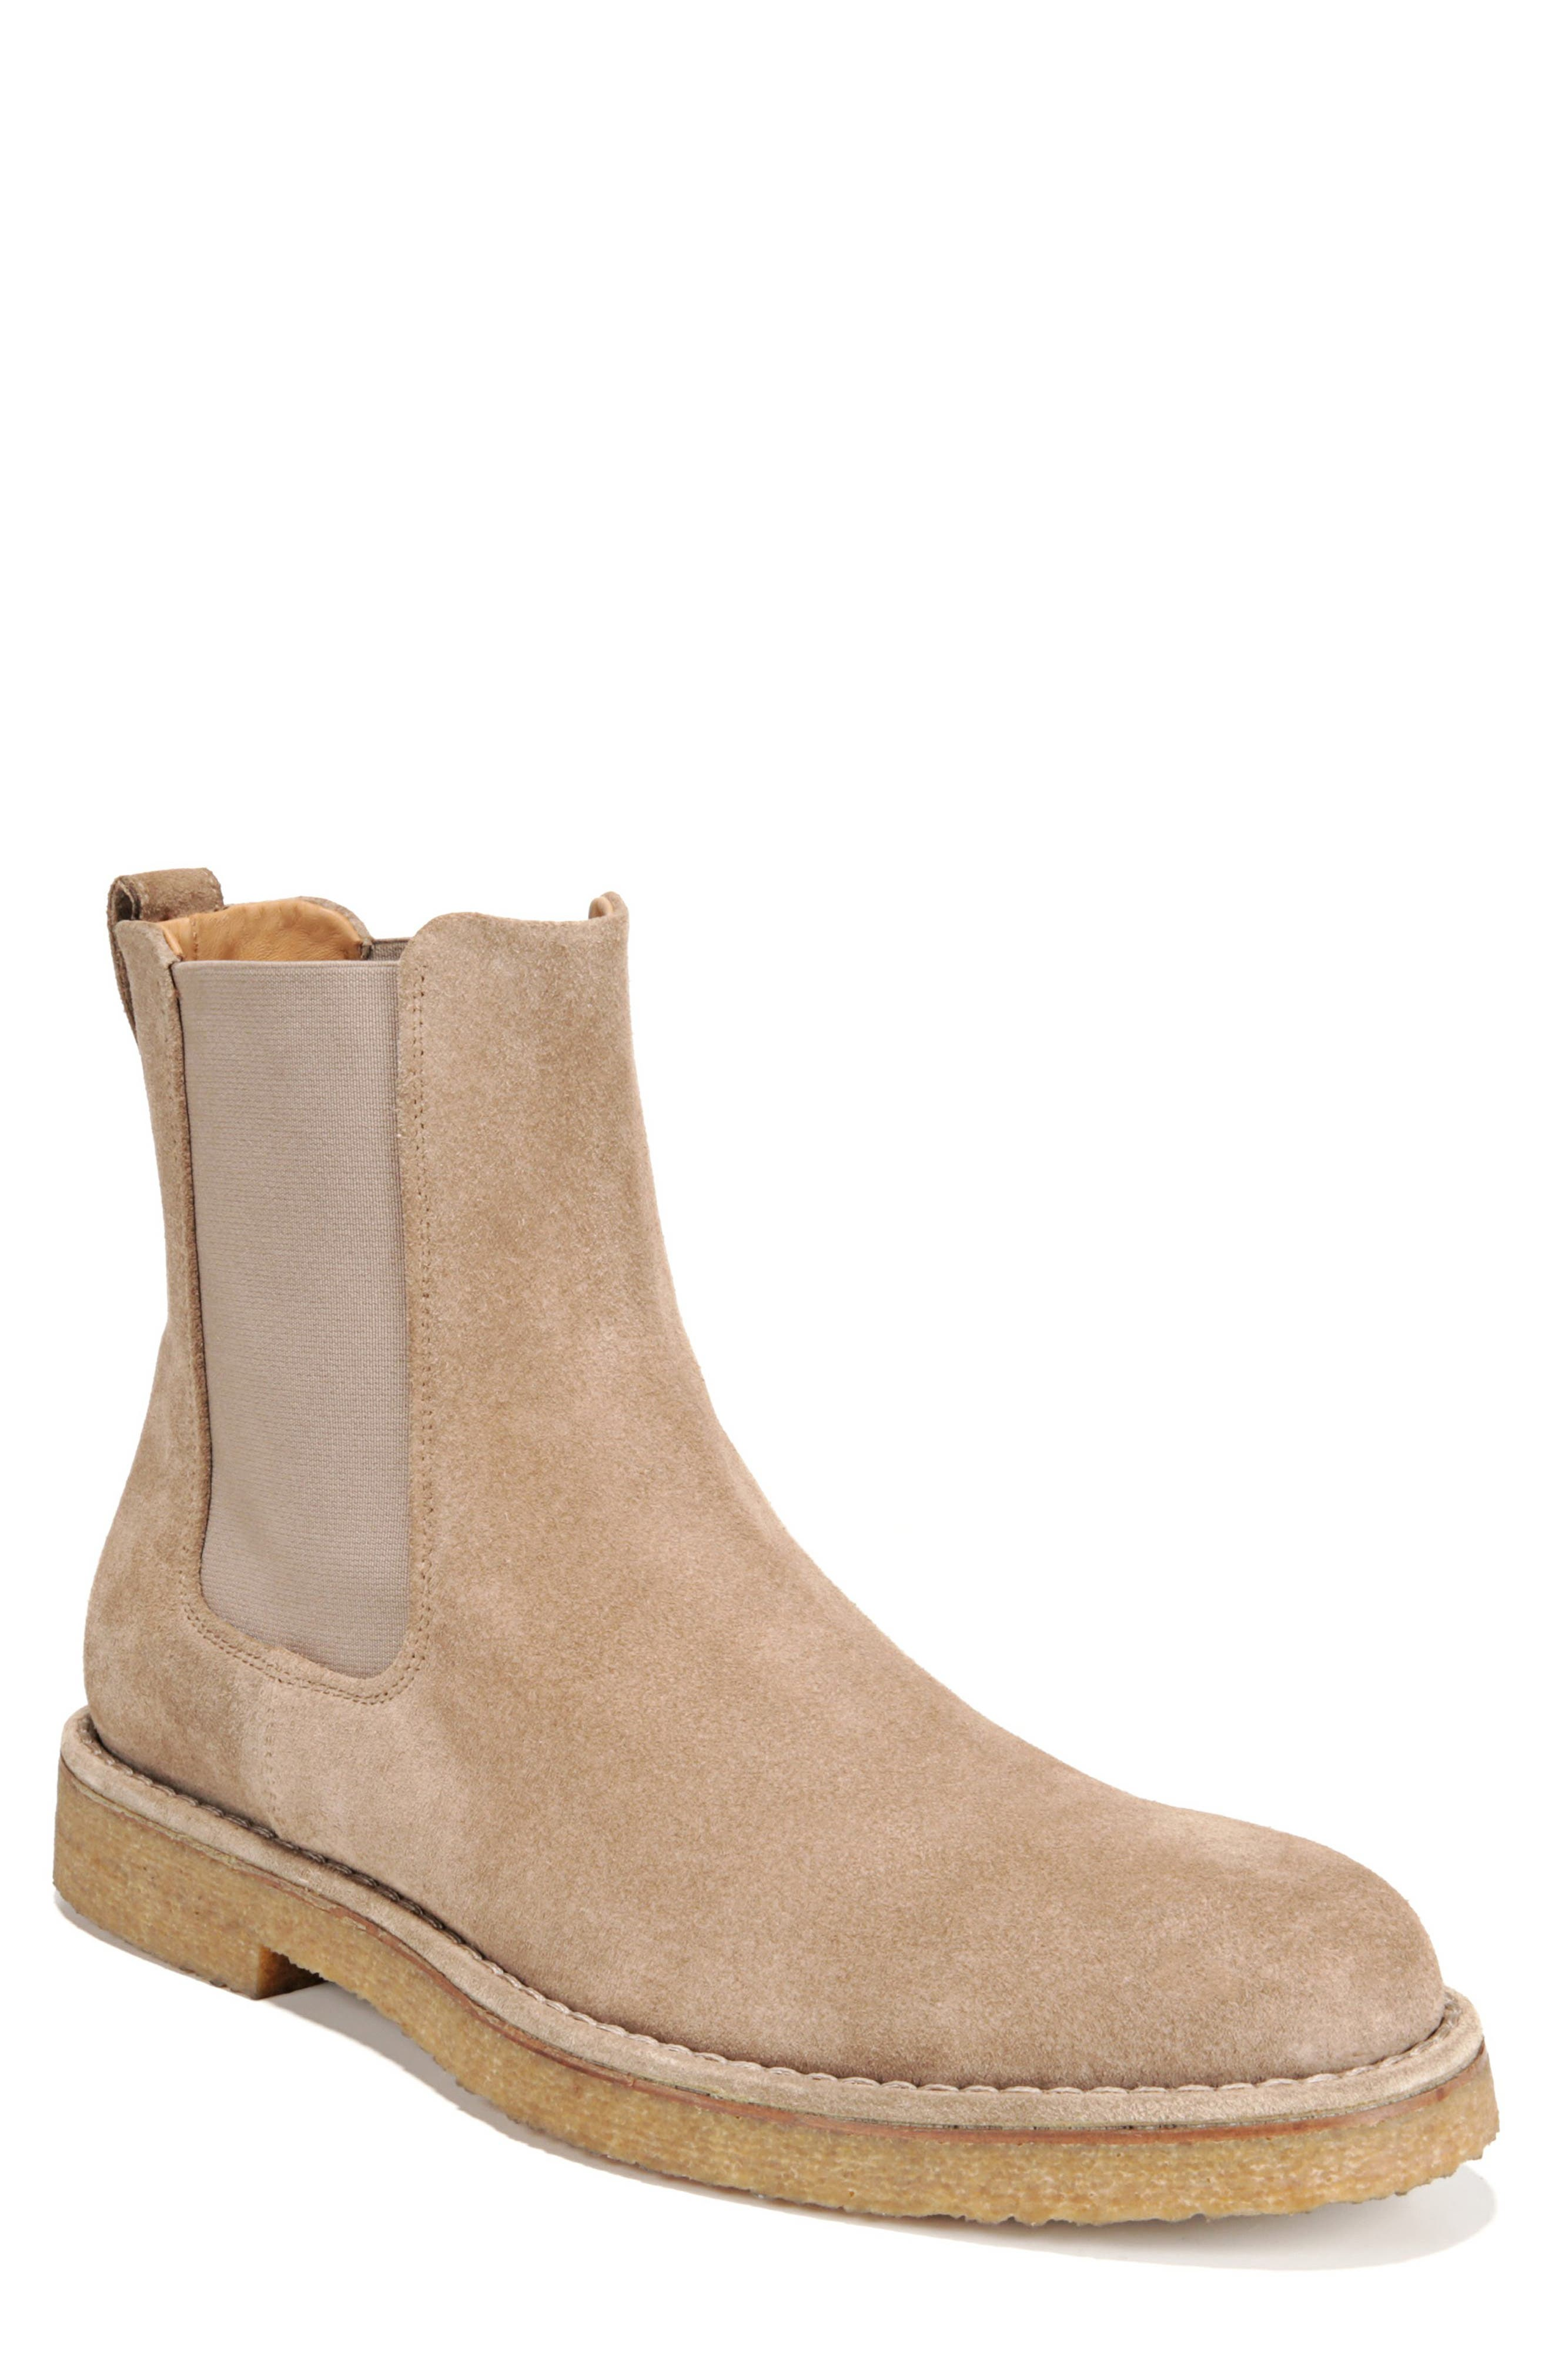 Cressler Chelsea Boot,                         Main,                         color, 250